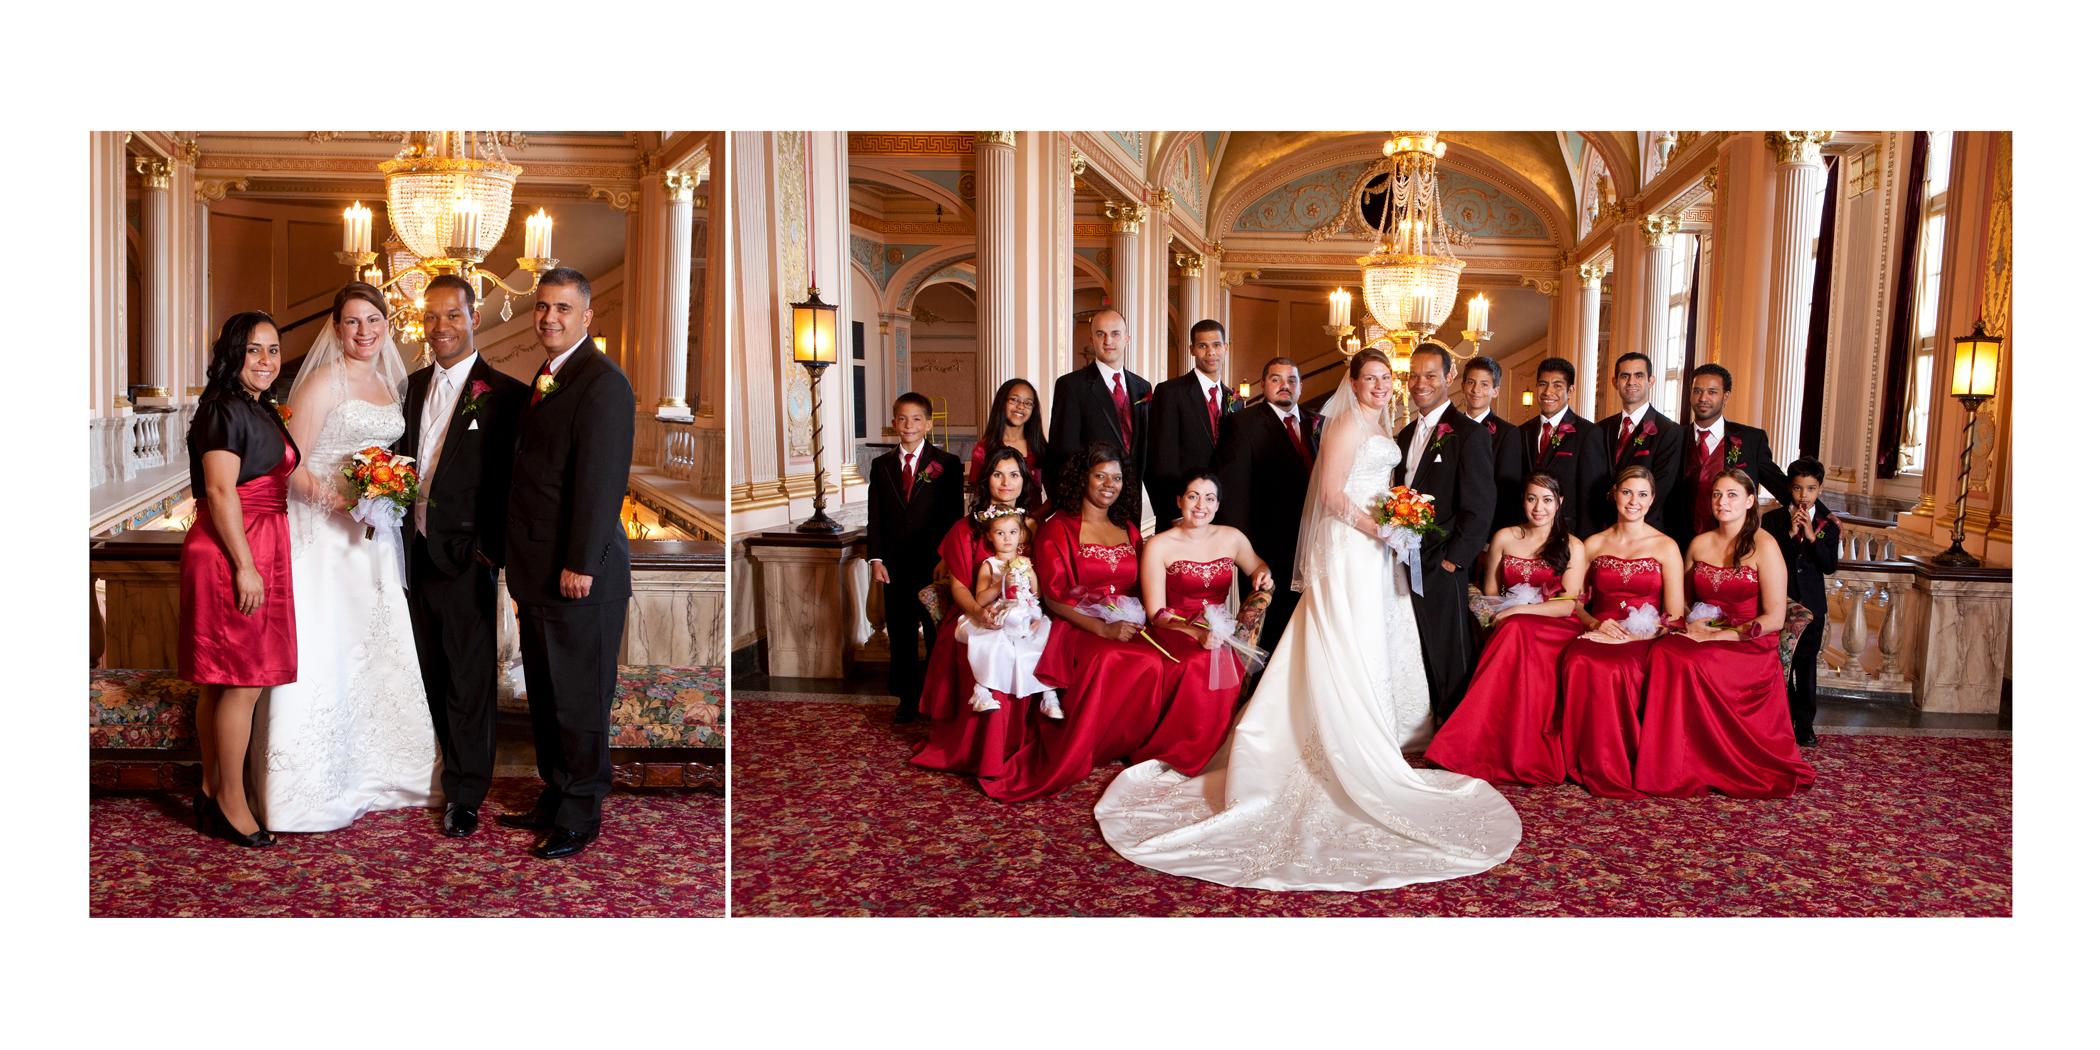 Wedding-Photography-Palaise-Royale-South-Bend-Indiana_28.jpg